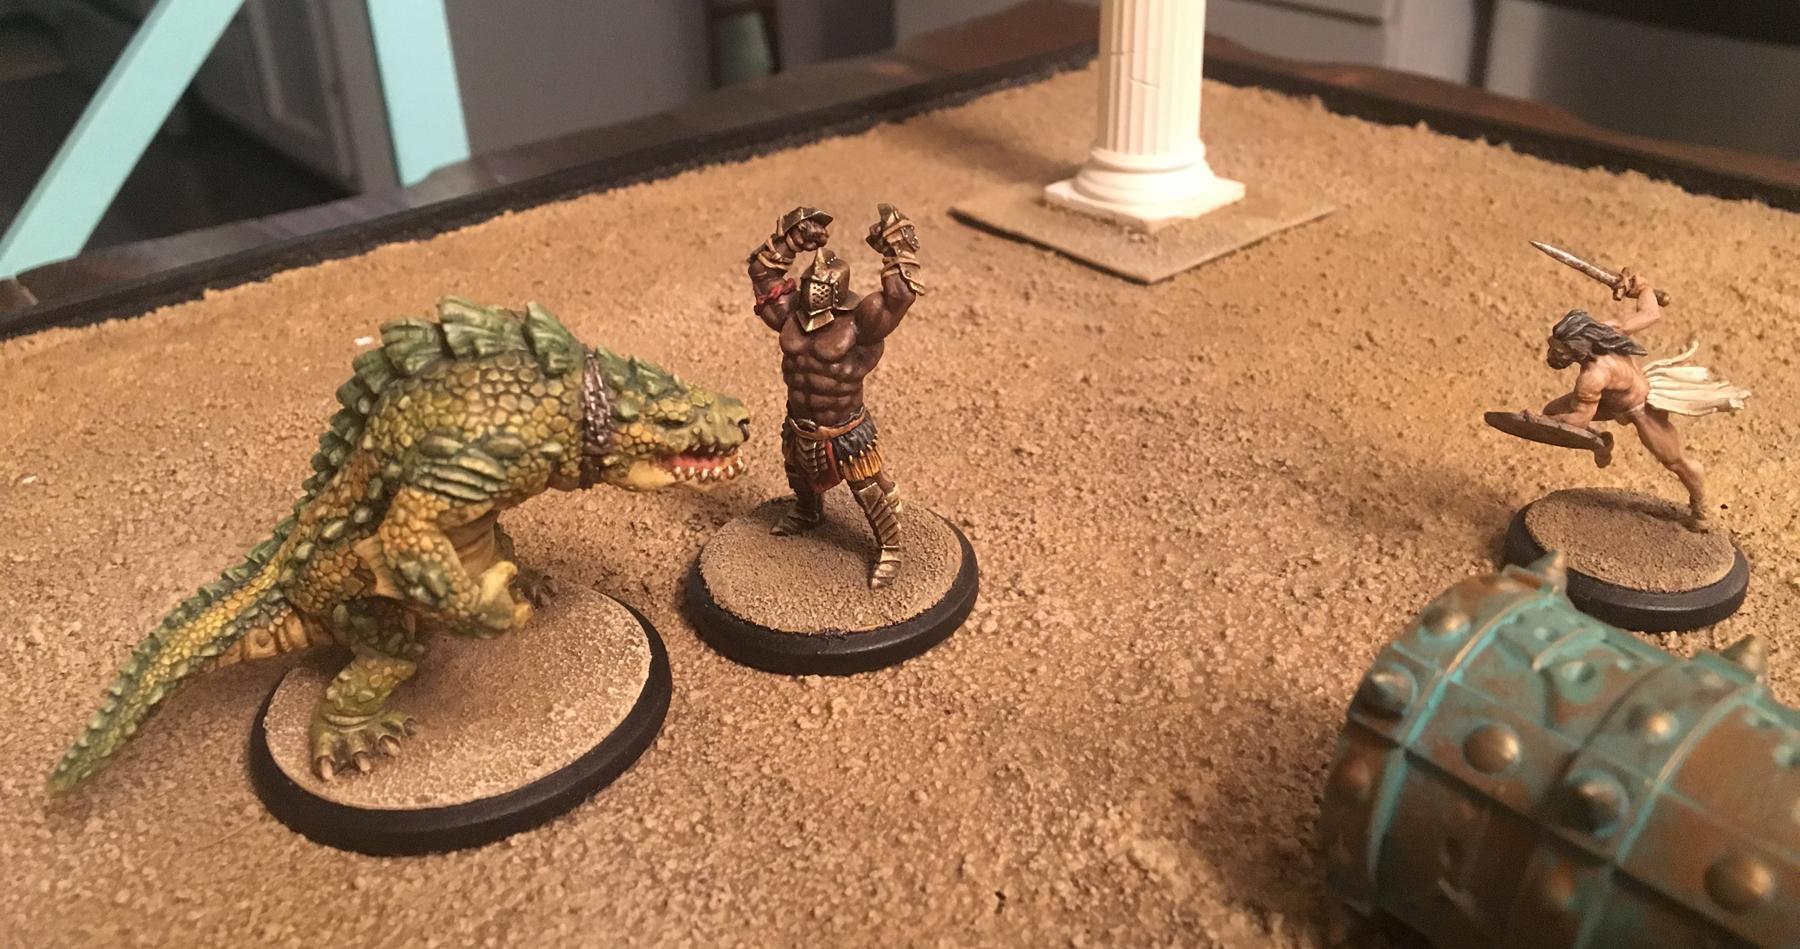 Arena Rex, Atrox, Gladiators, Micon, Noxius, Red Republic Games